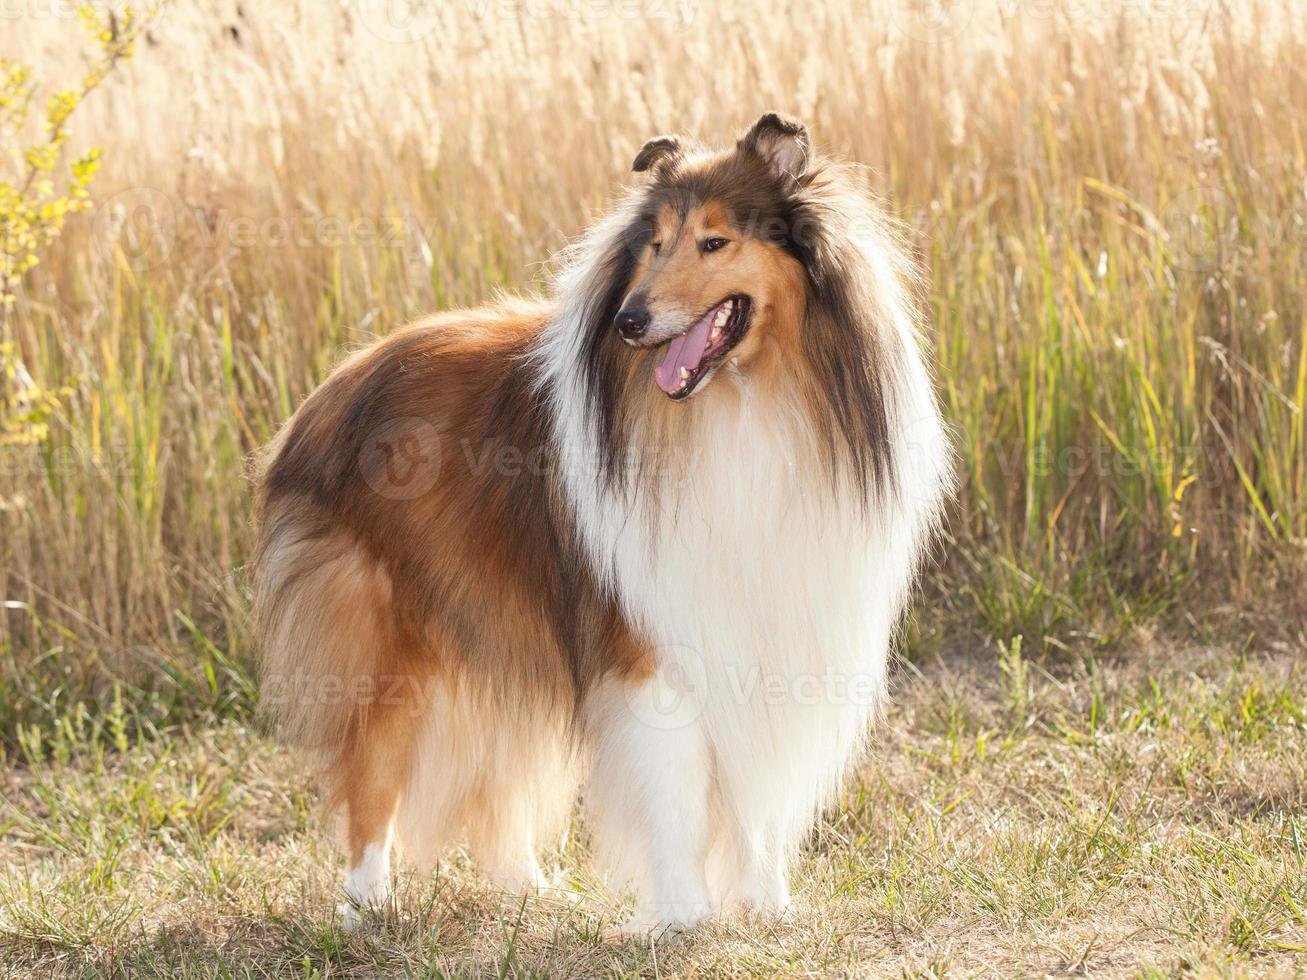 Retrato de perro de raza pura collie áspero. foto